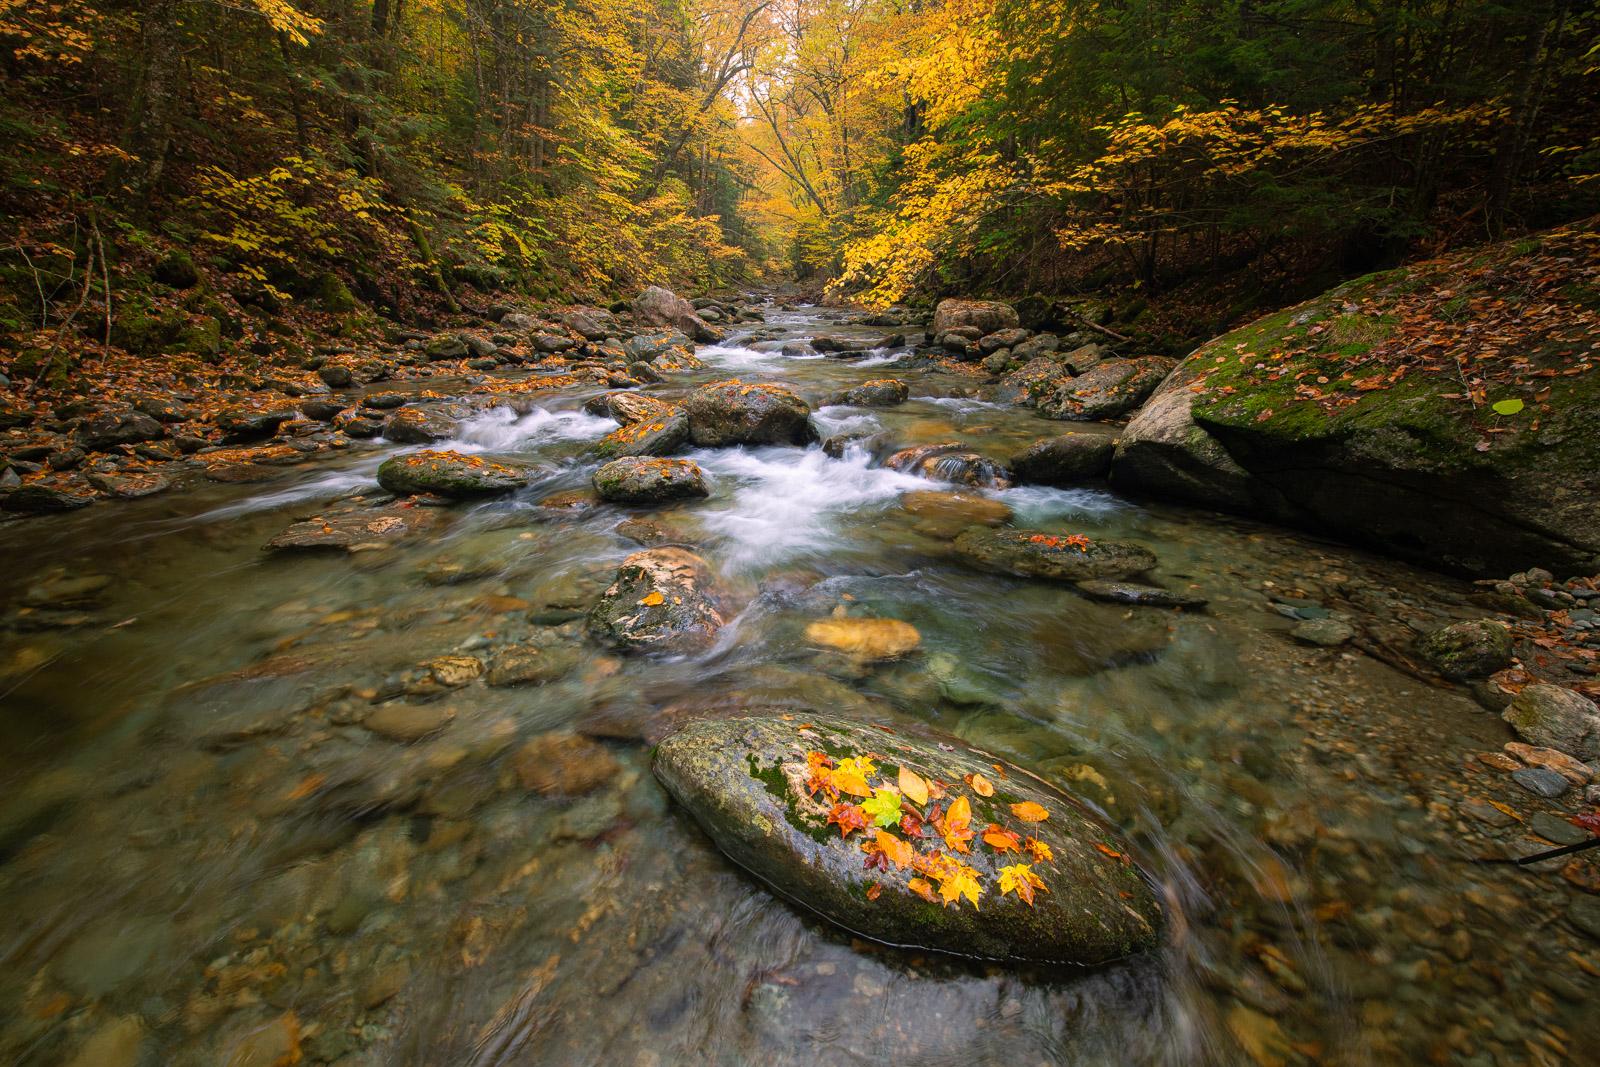 Autumn color along a pristine mountain stream.